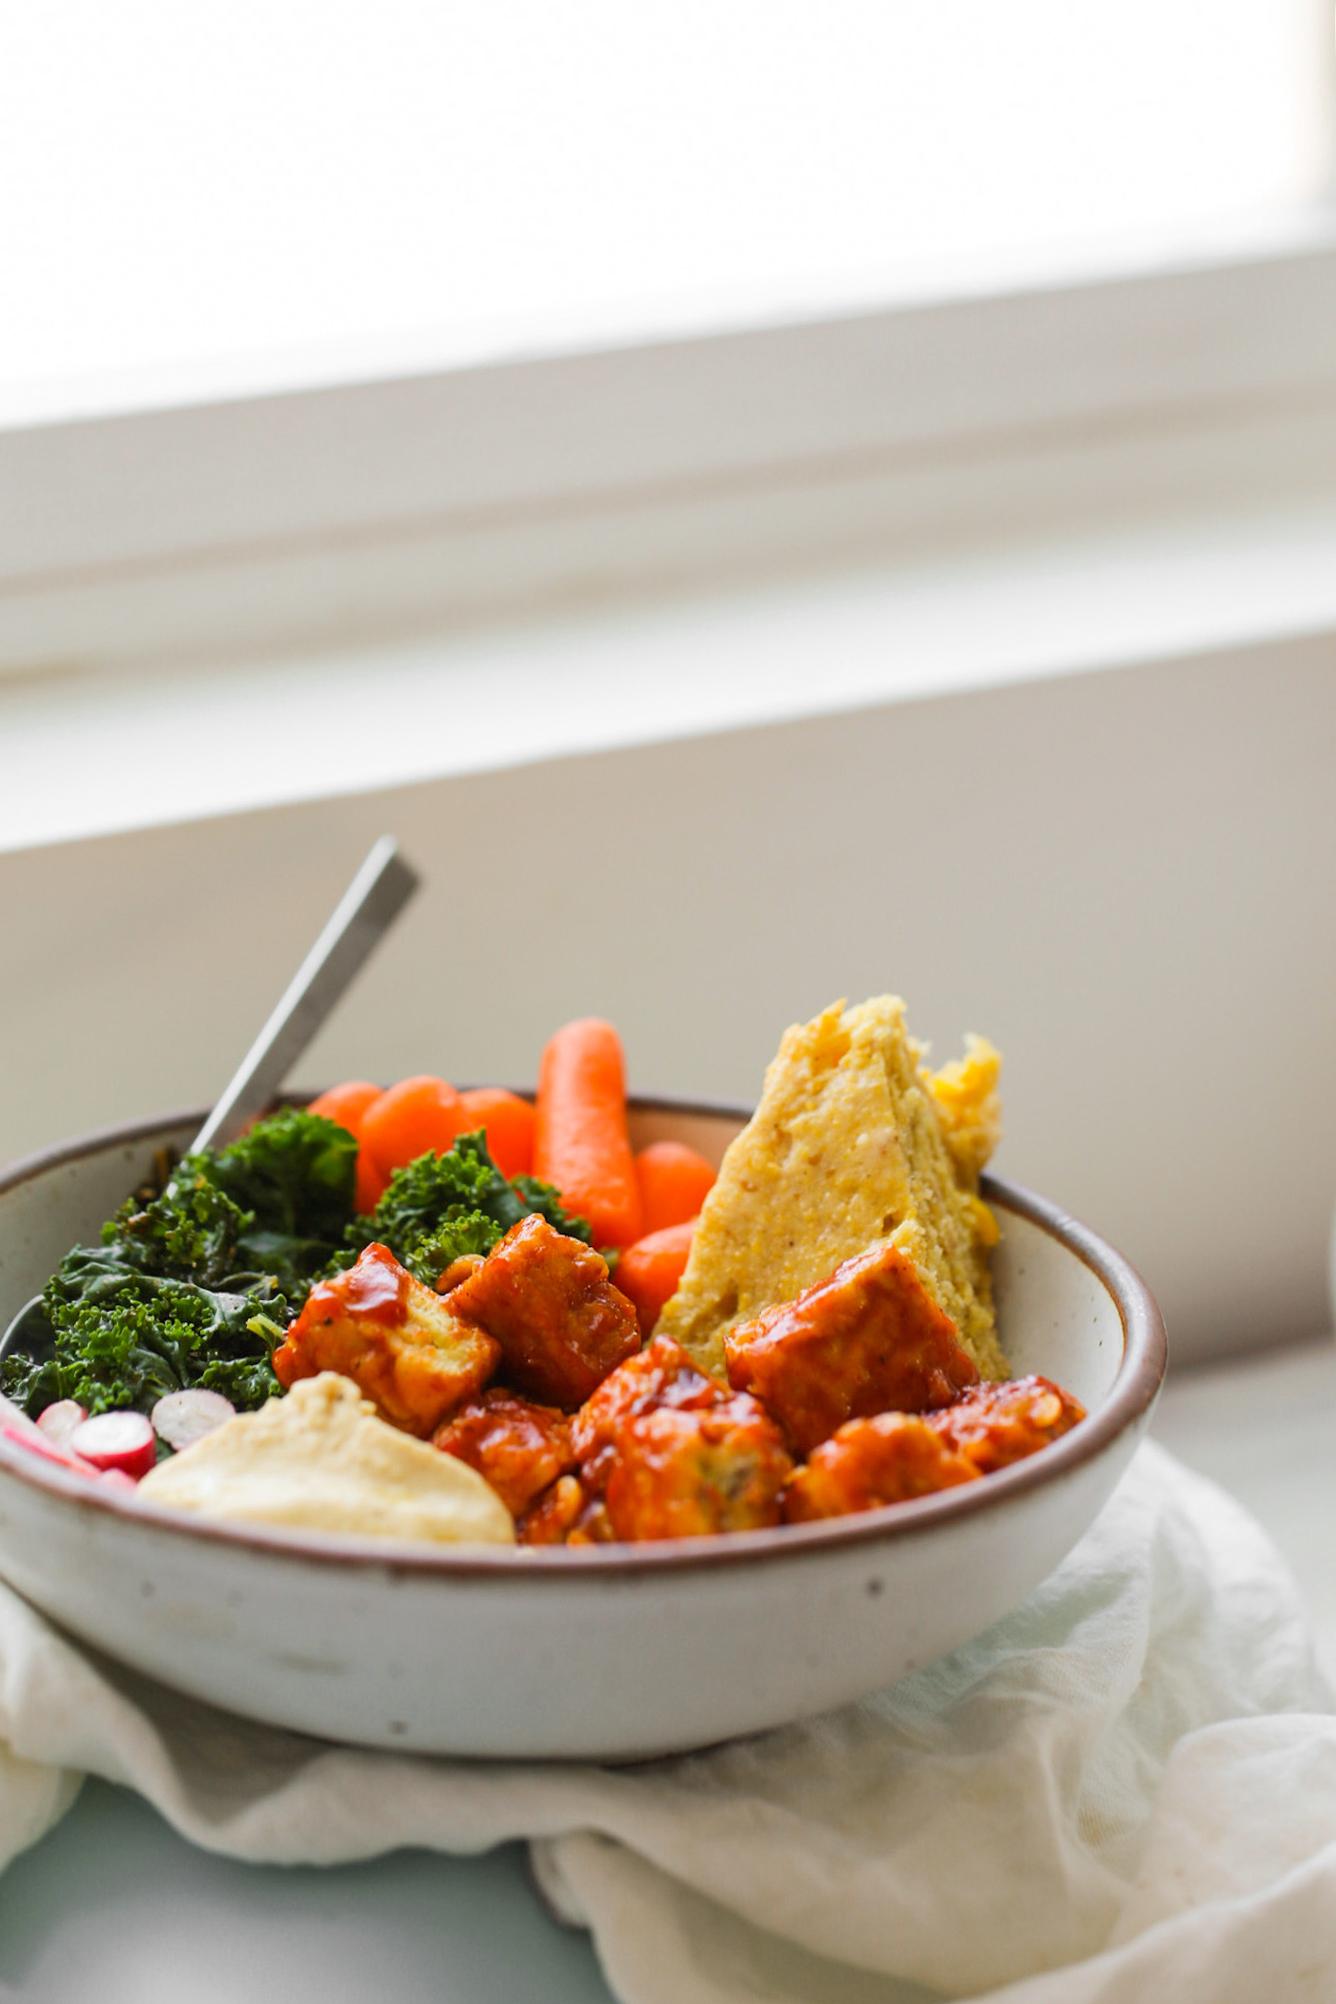 bbq tempeh kale bowl